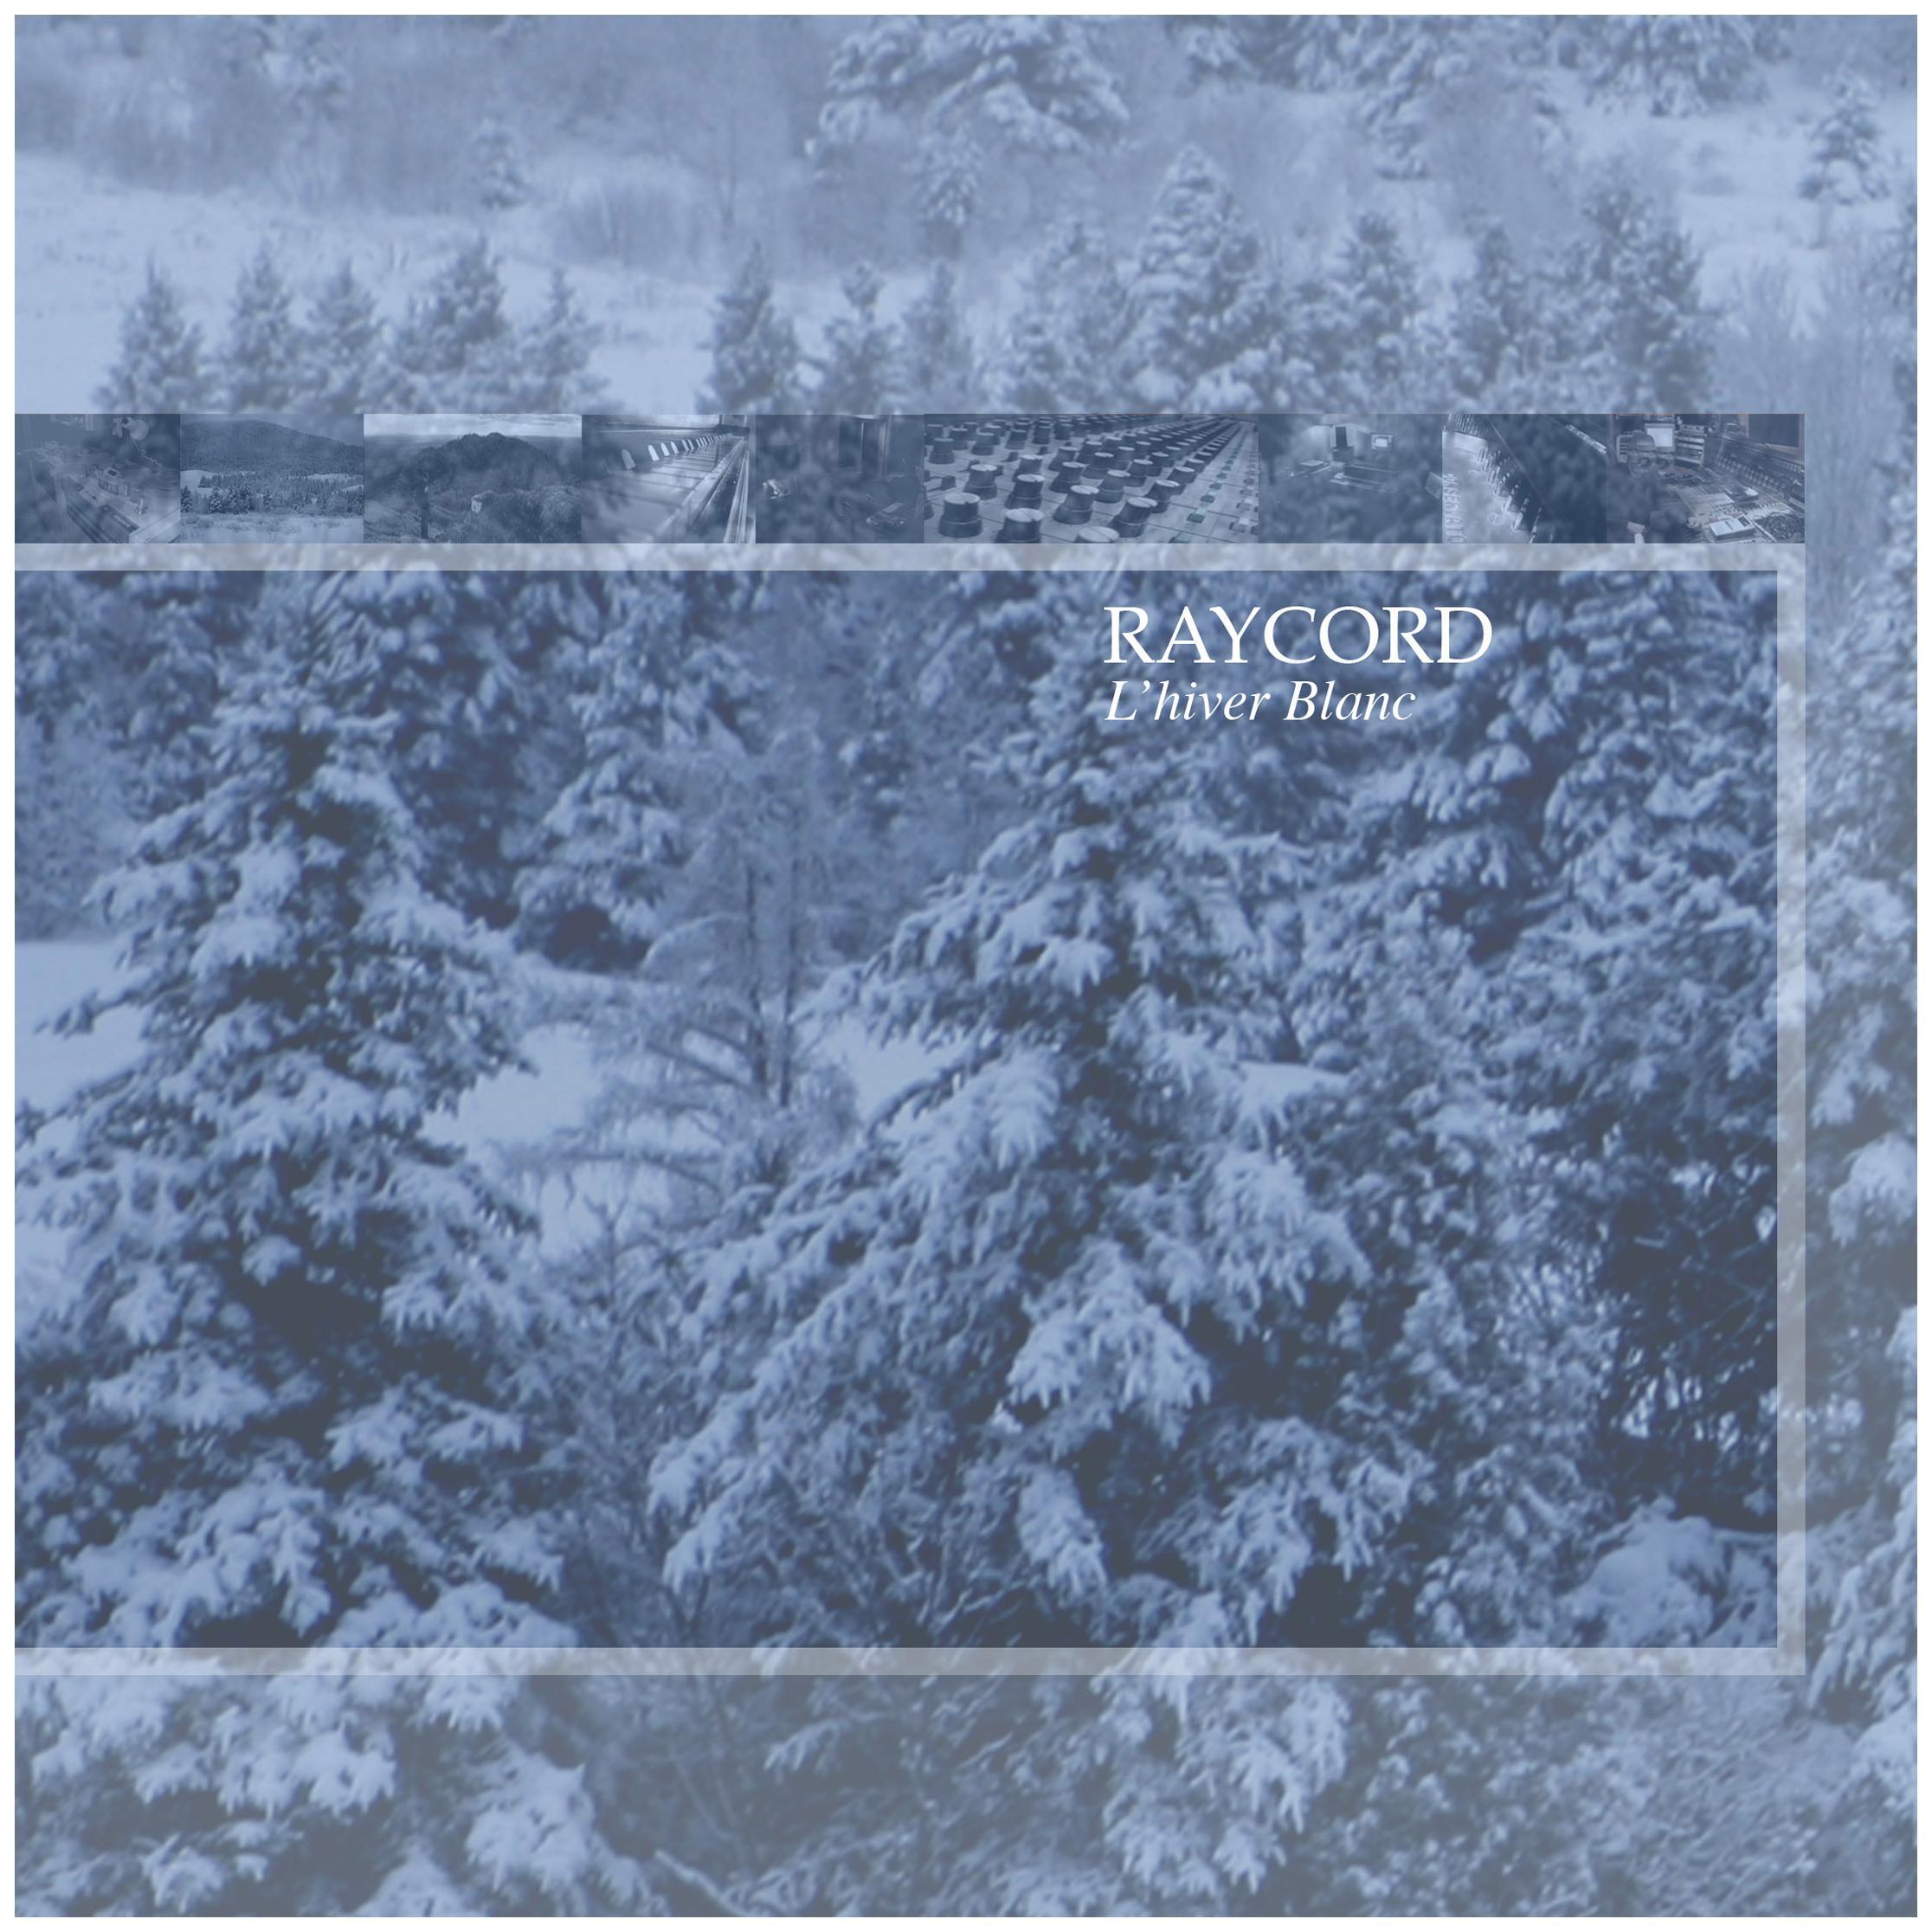 RAYCORD L hiver blanc copy